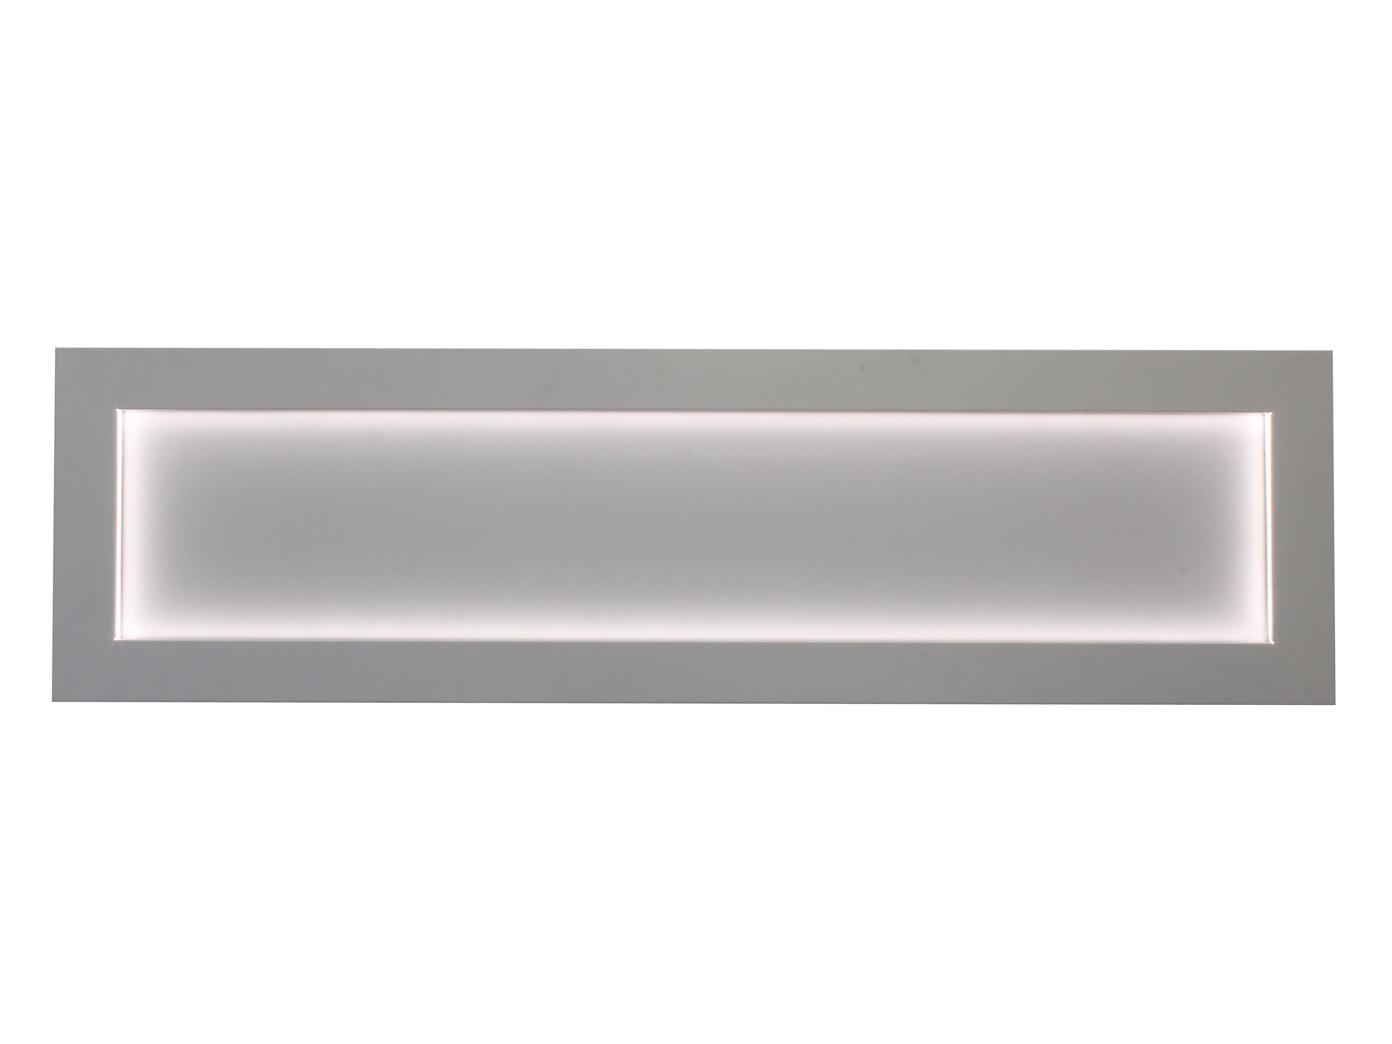 wanddeko magnettafel aus metall mit led beleuchtung 41 x 150 cm 20w kalamitica 8032836942492 ebay. Black Bedroom Furniture Sets. Home Design Ideas